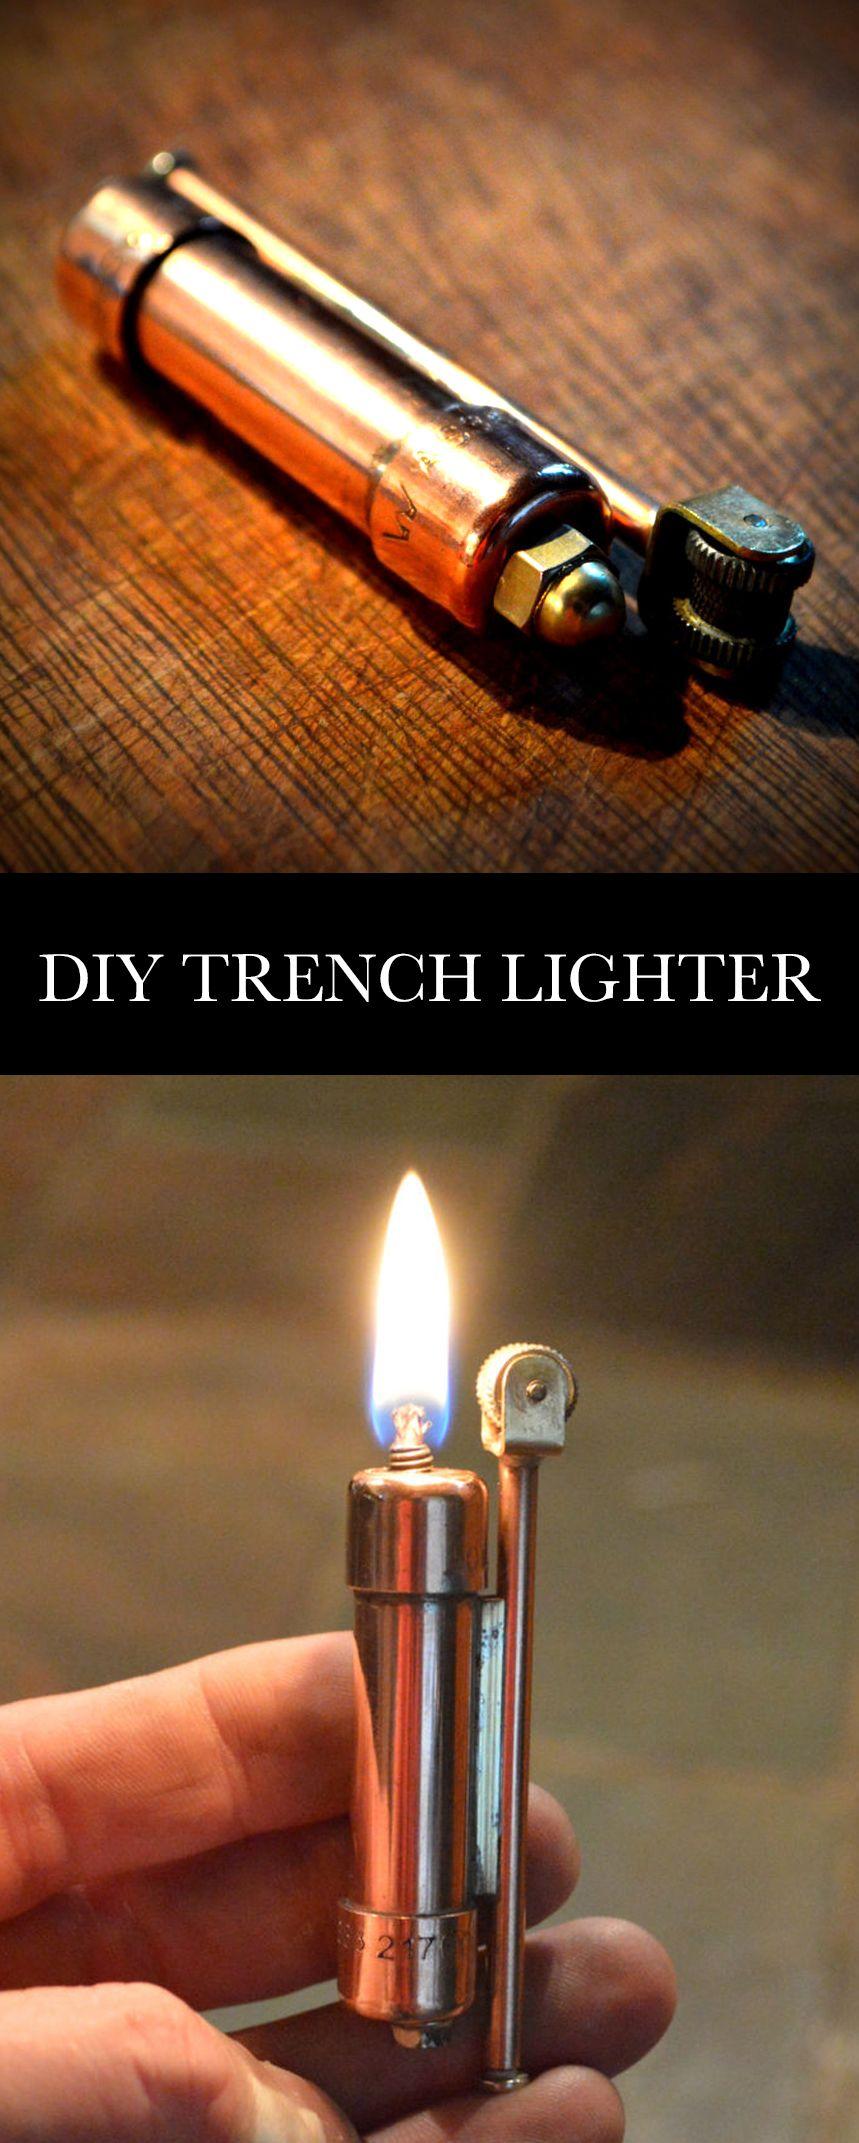 Park Art My WordPress Blog_How Do I Dispose Of Lighter Fluid